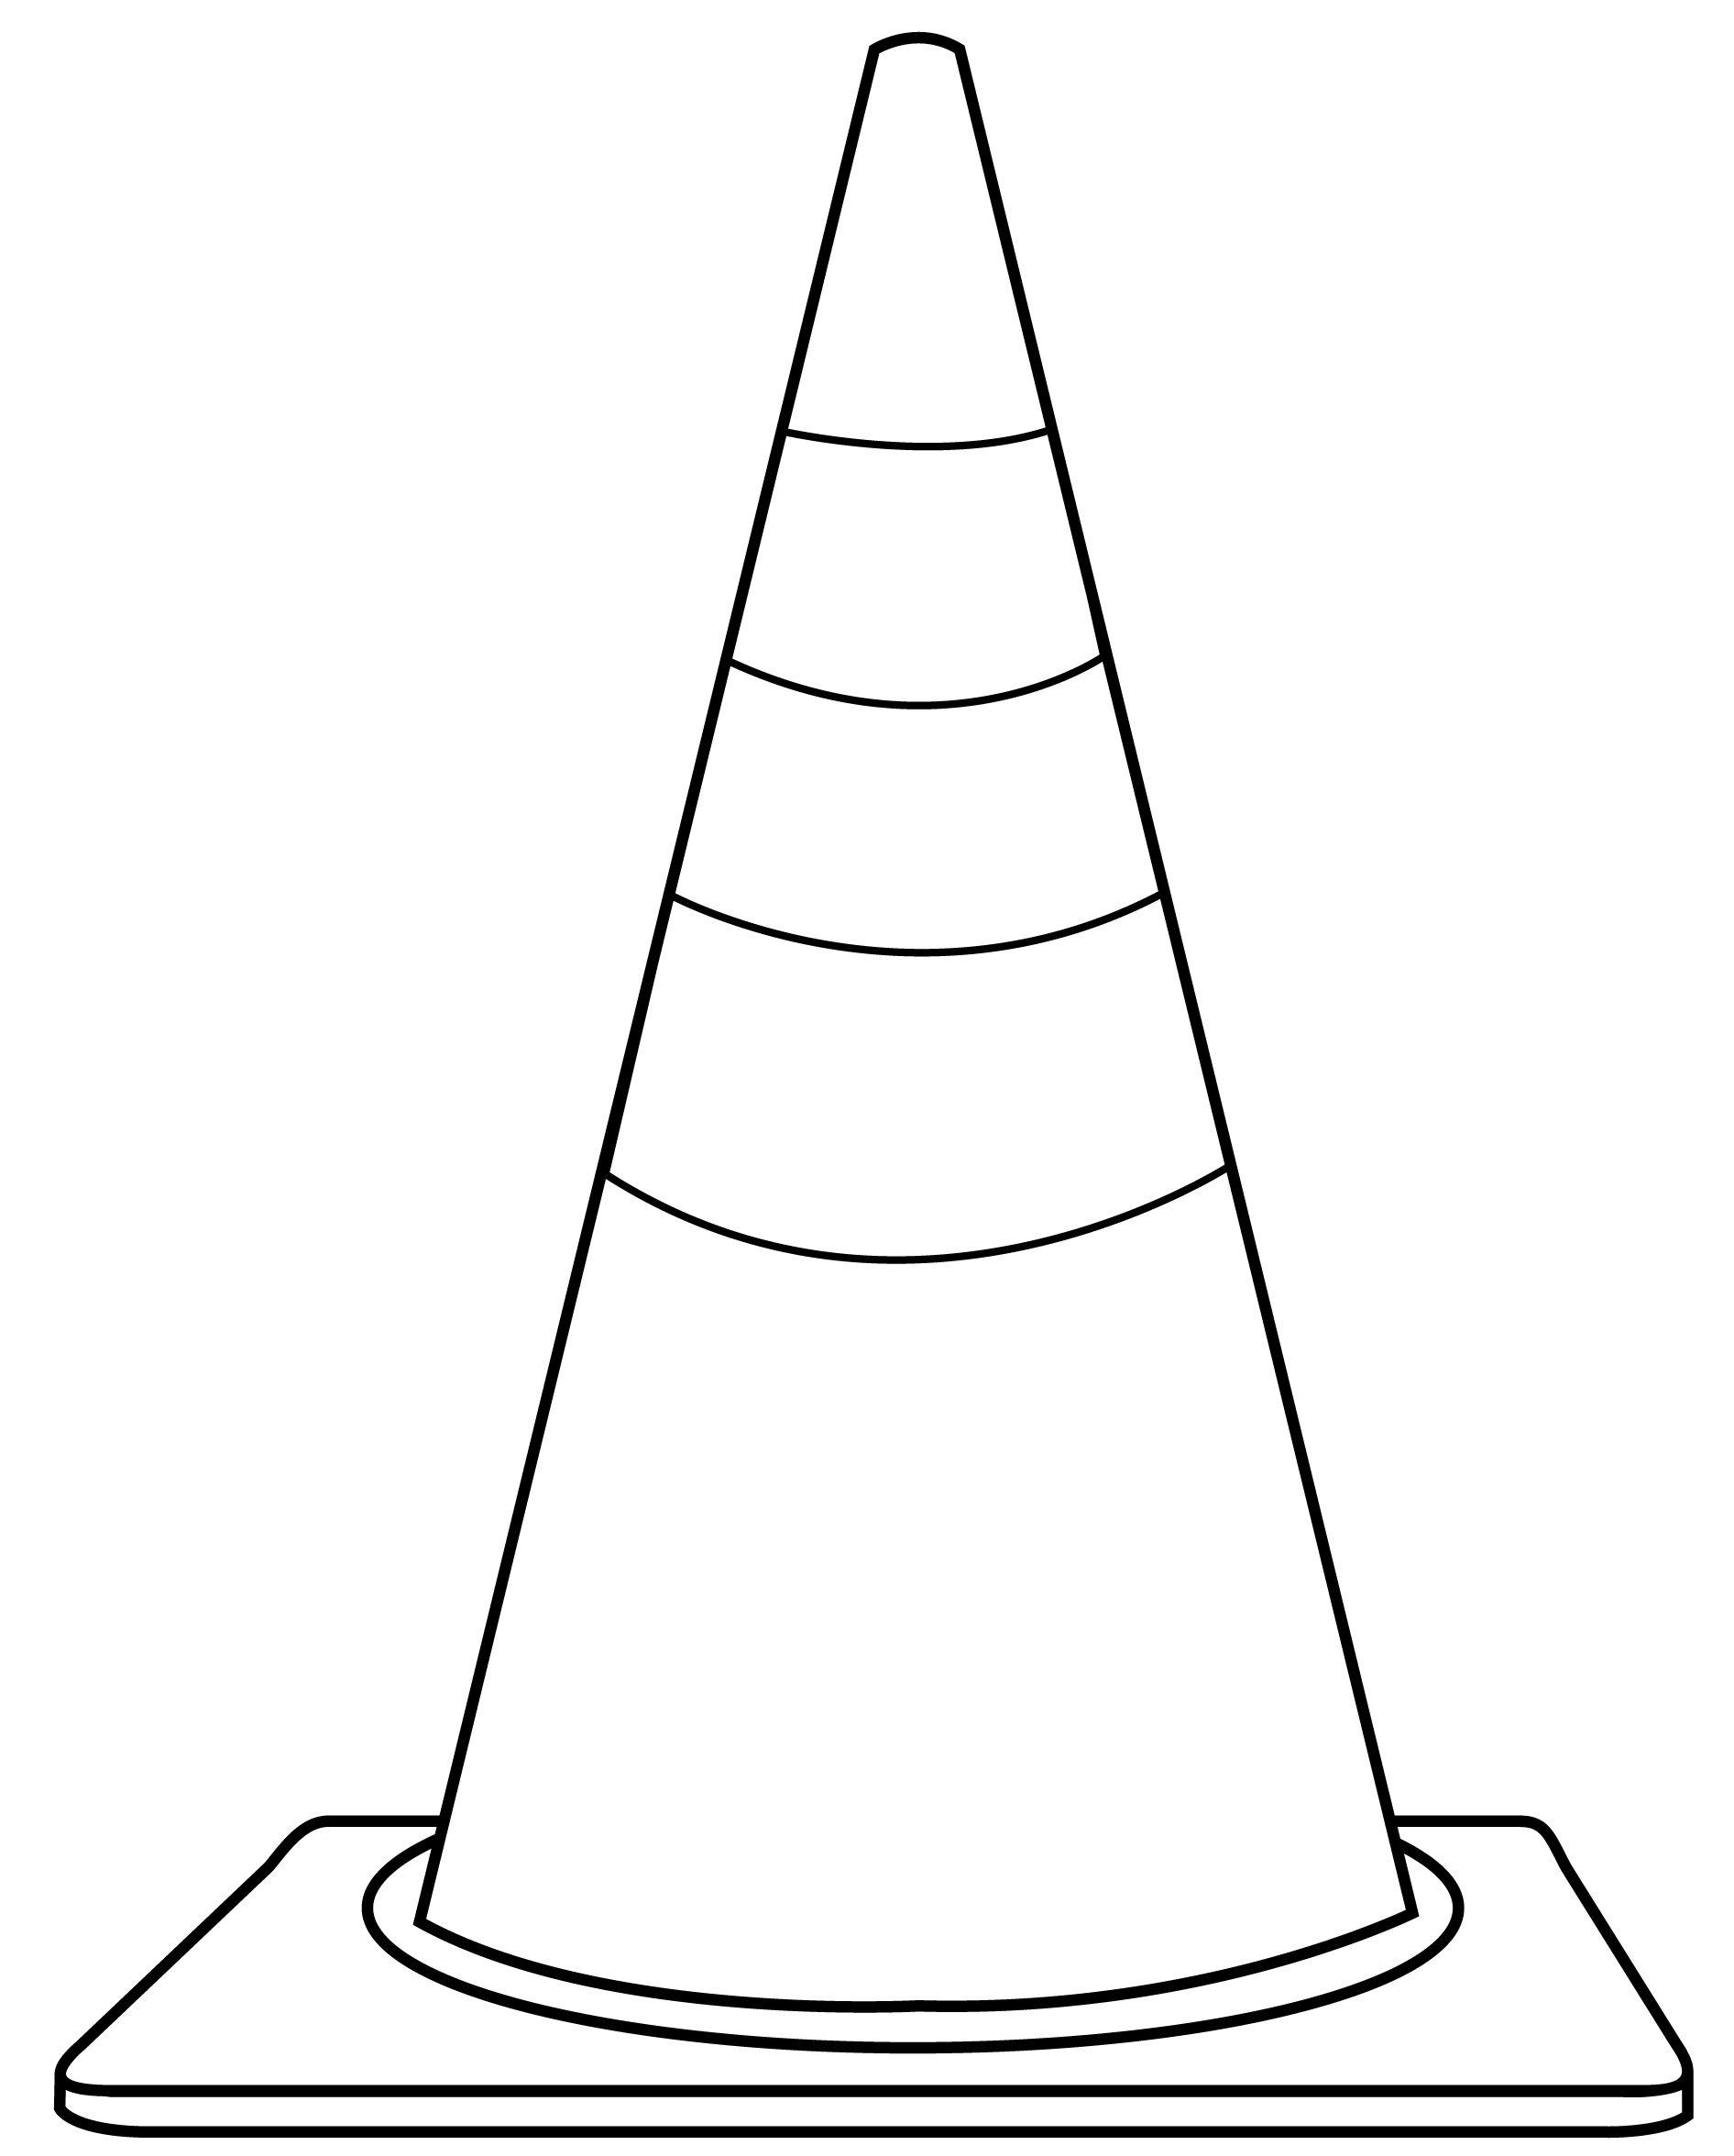 Clip Art Traffic Cone Clipart - Clipart Kid